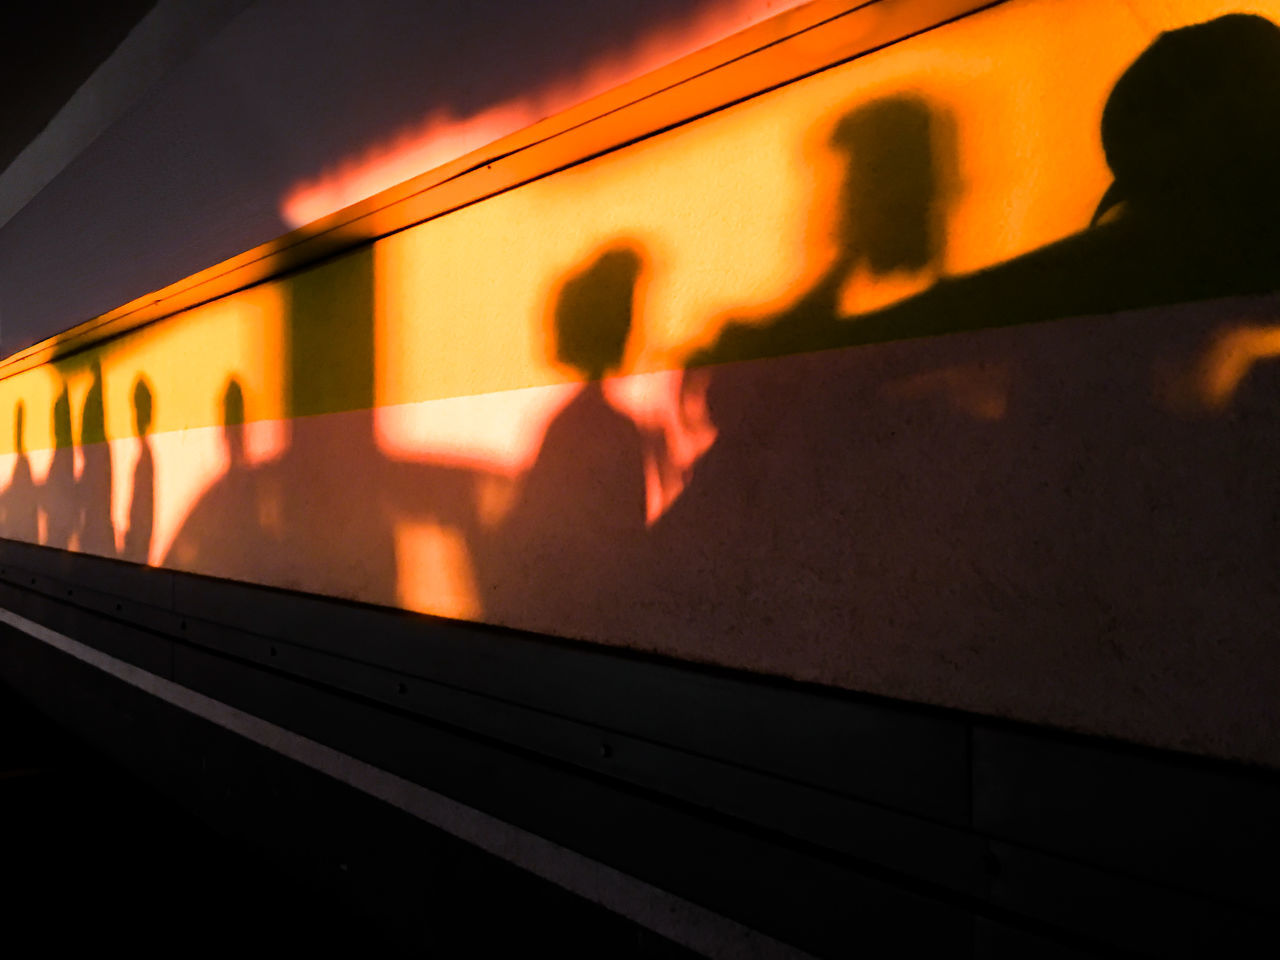 Shadow of people on illuminated wall at night